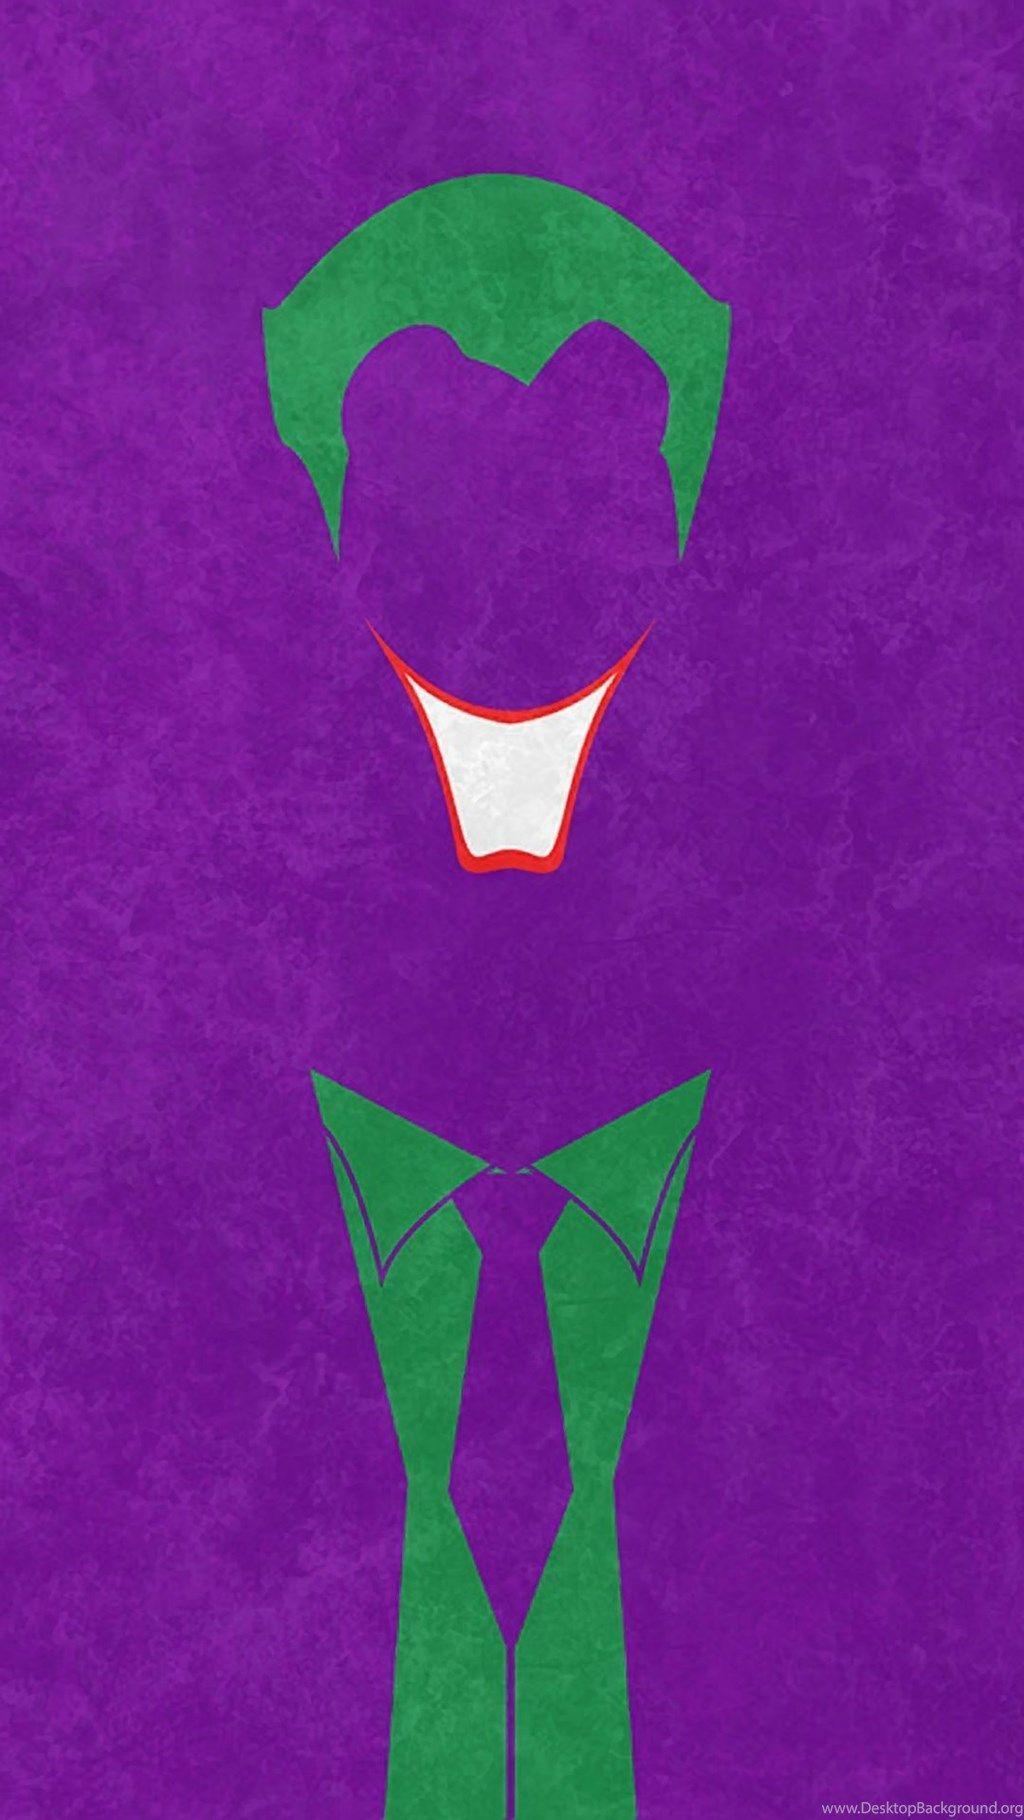 55 Best Free Minimalist Joker IPhone Wallpapers